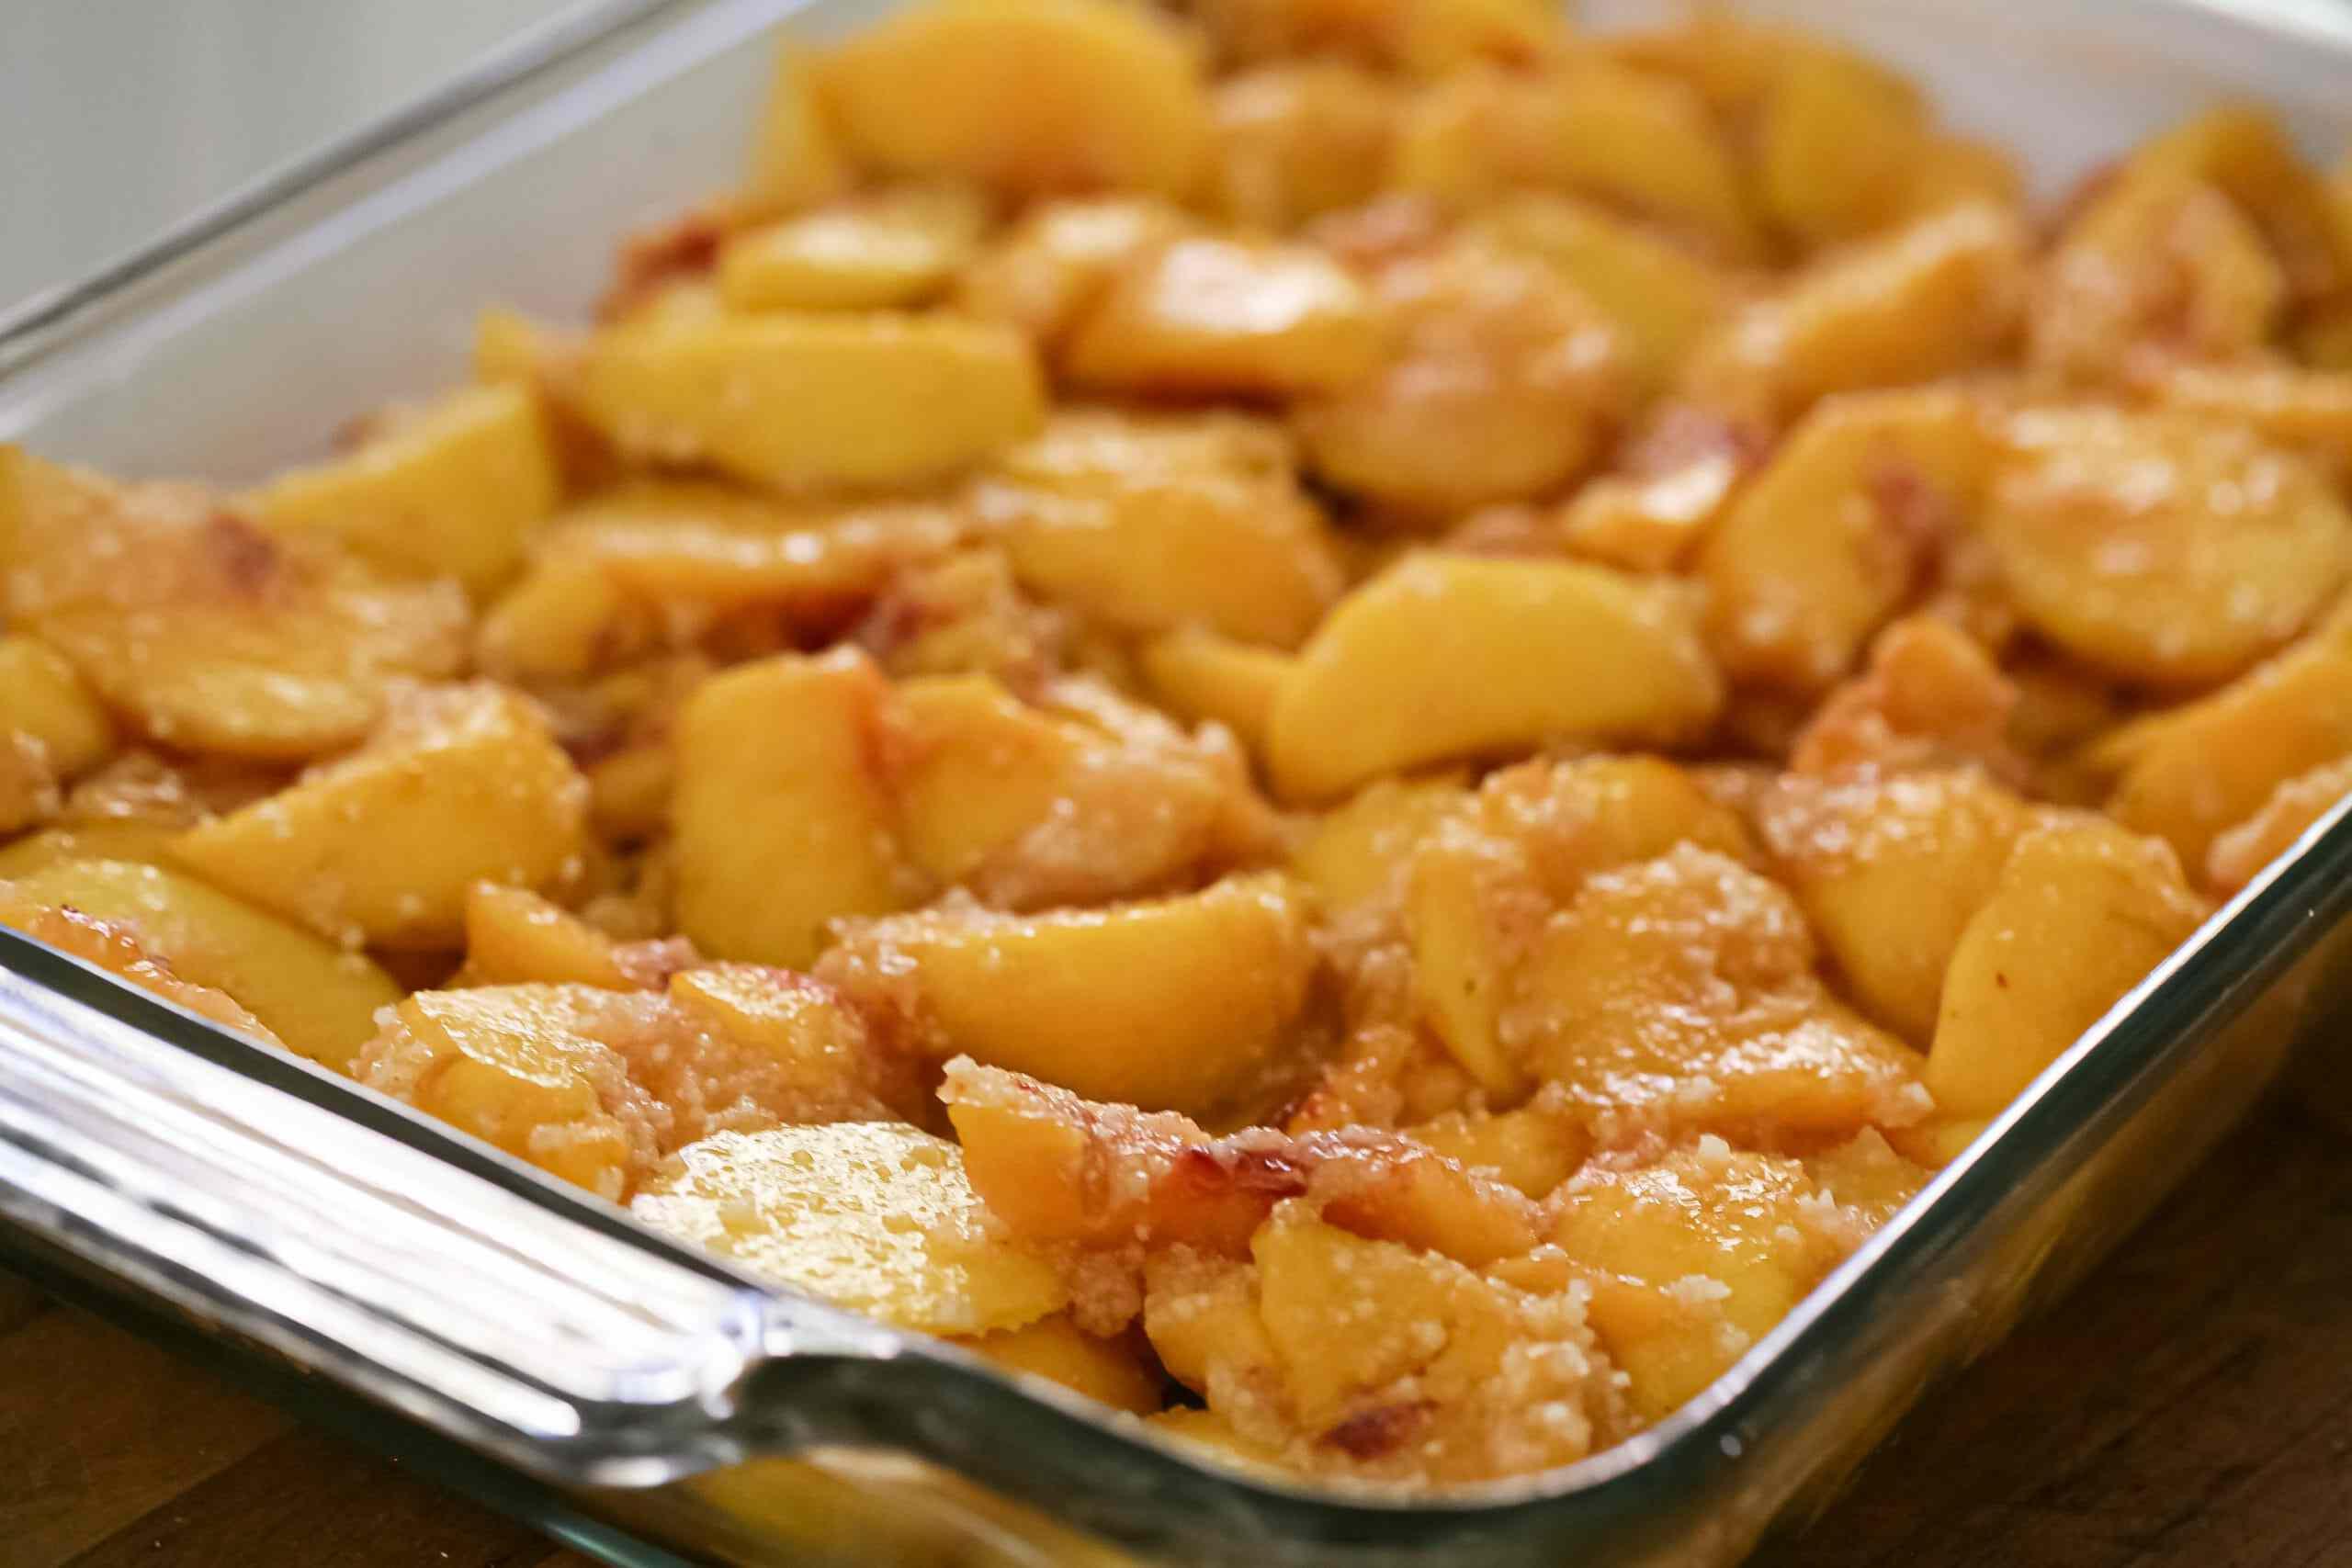 All the peaches for homemade peach cobbler in a baking dish